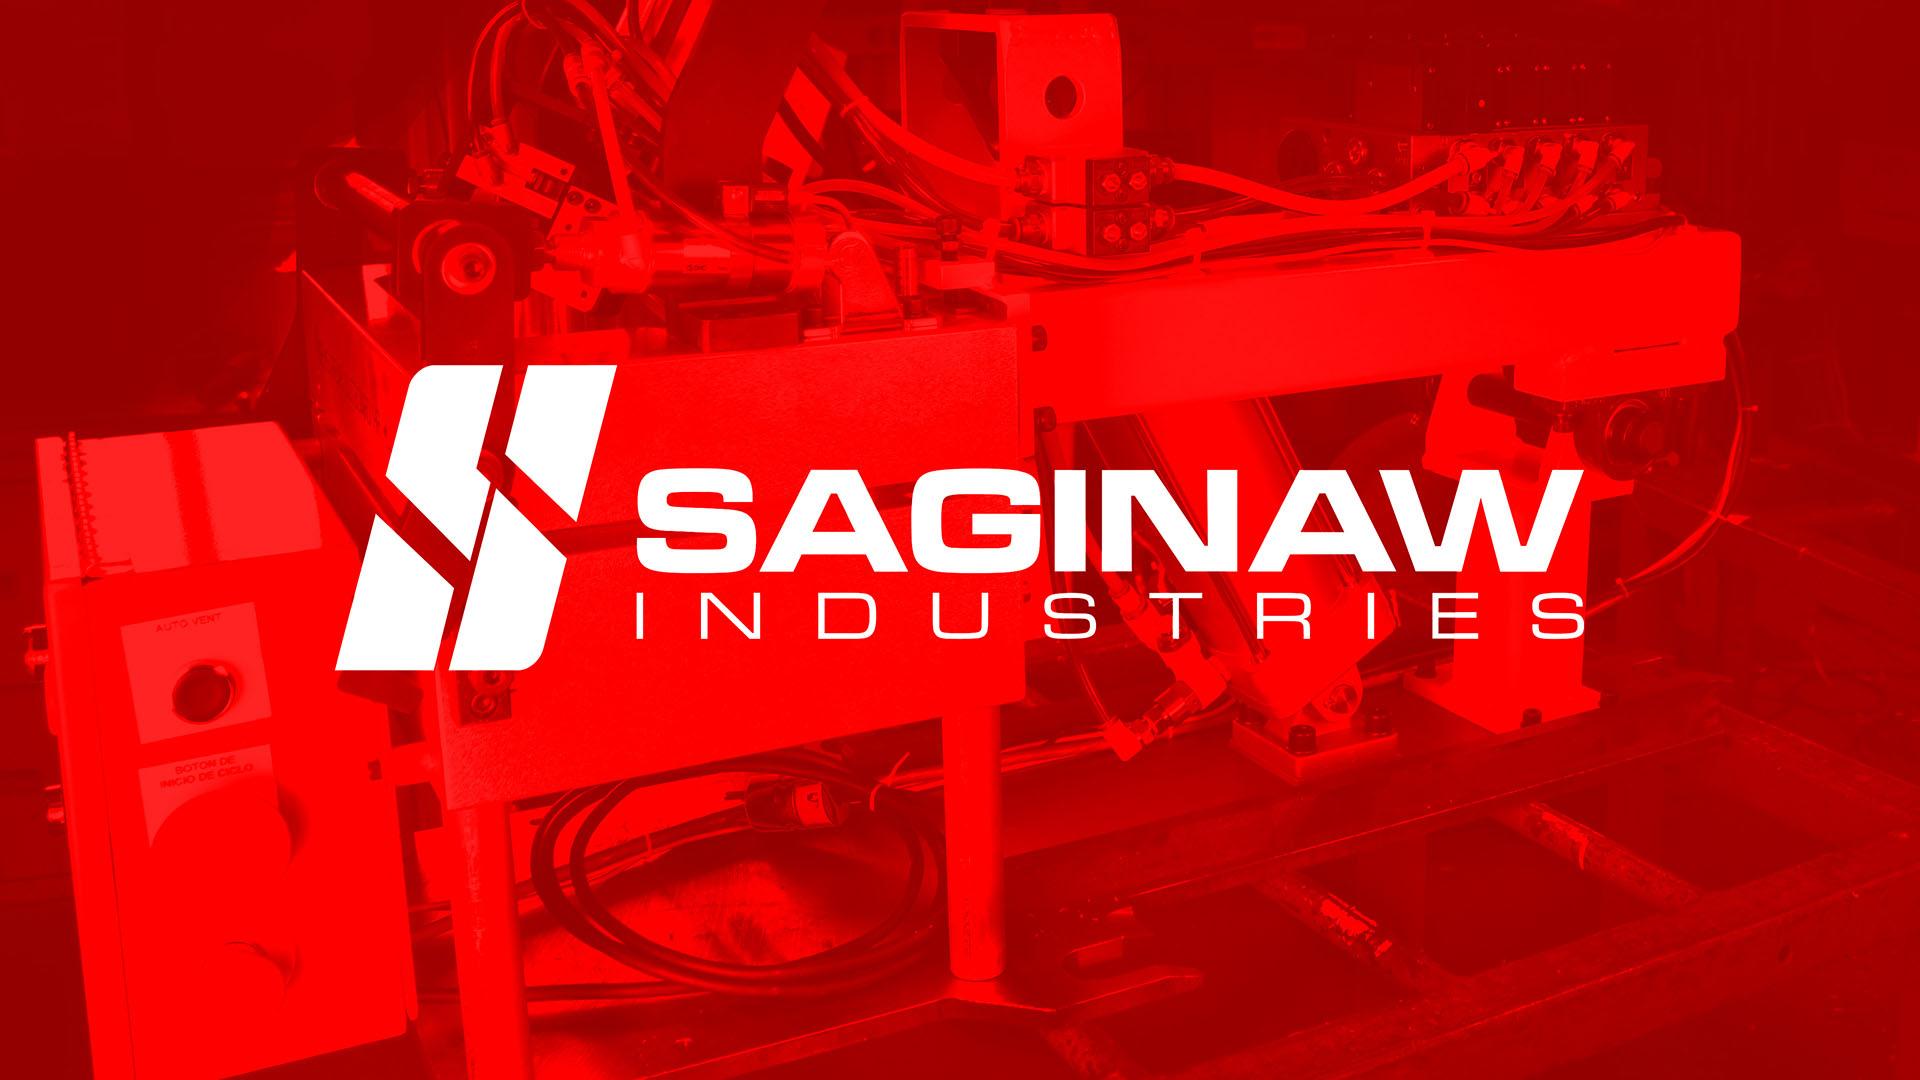 Saginaw Industries